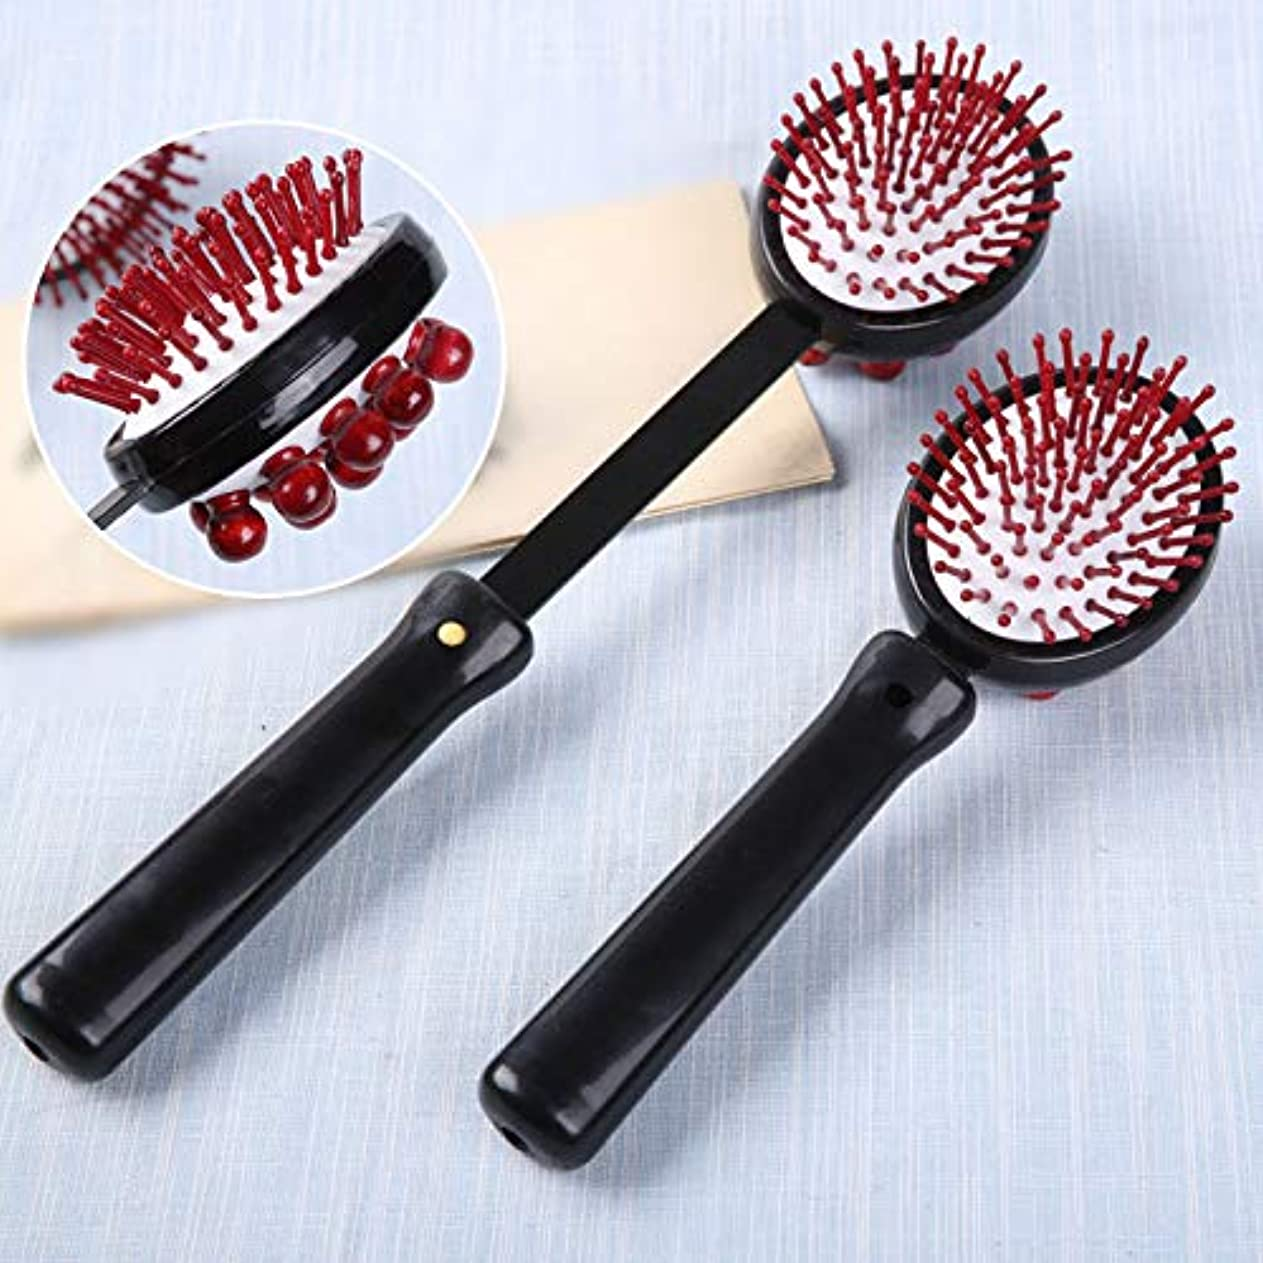 1 PC Back Knock Massage Hammer Stress fatigue Relief Handle Wood Scratcher Relaxing Massager Stick Body Health...